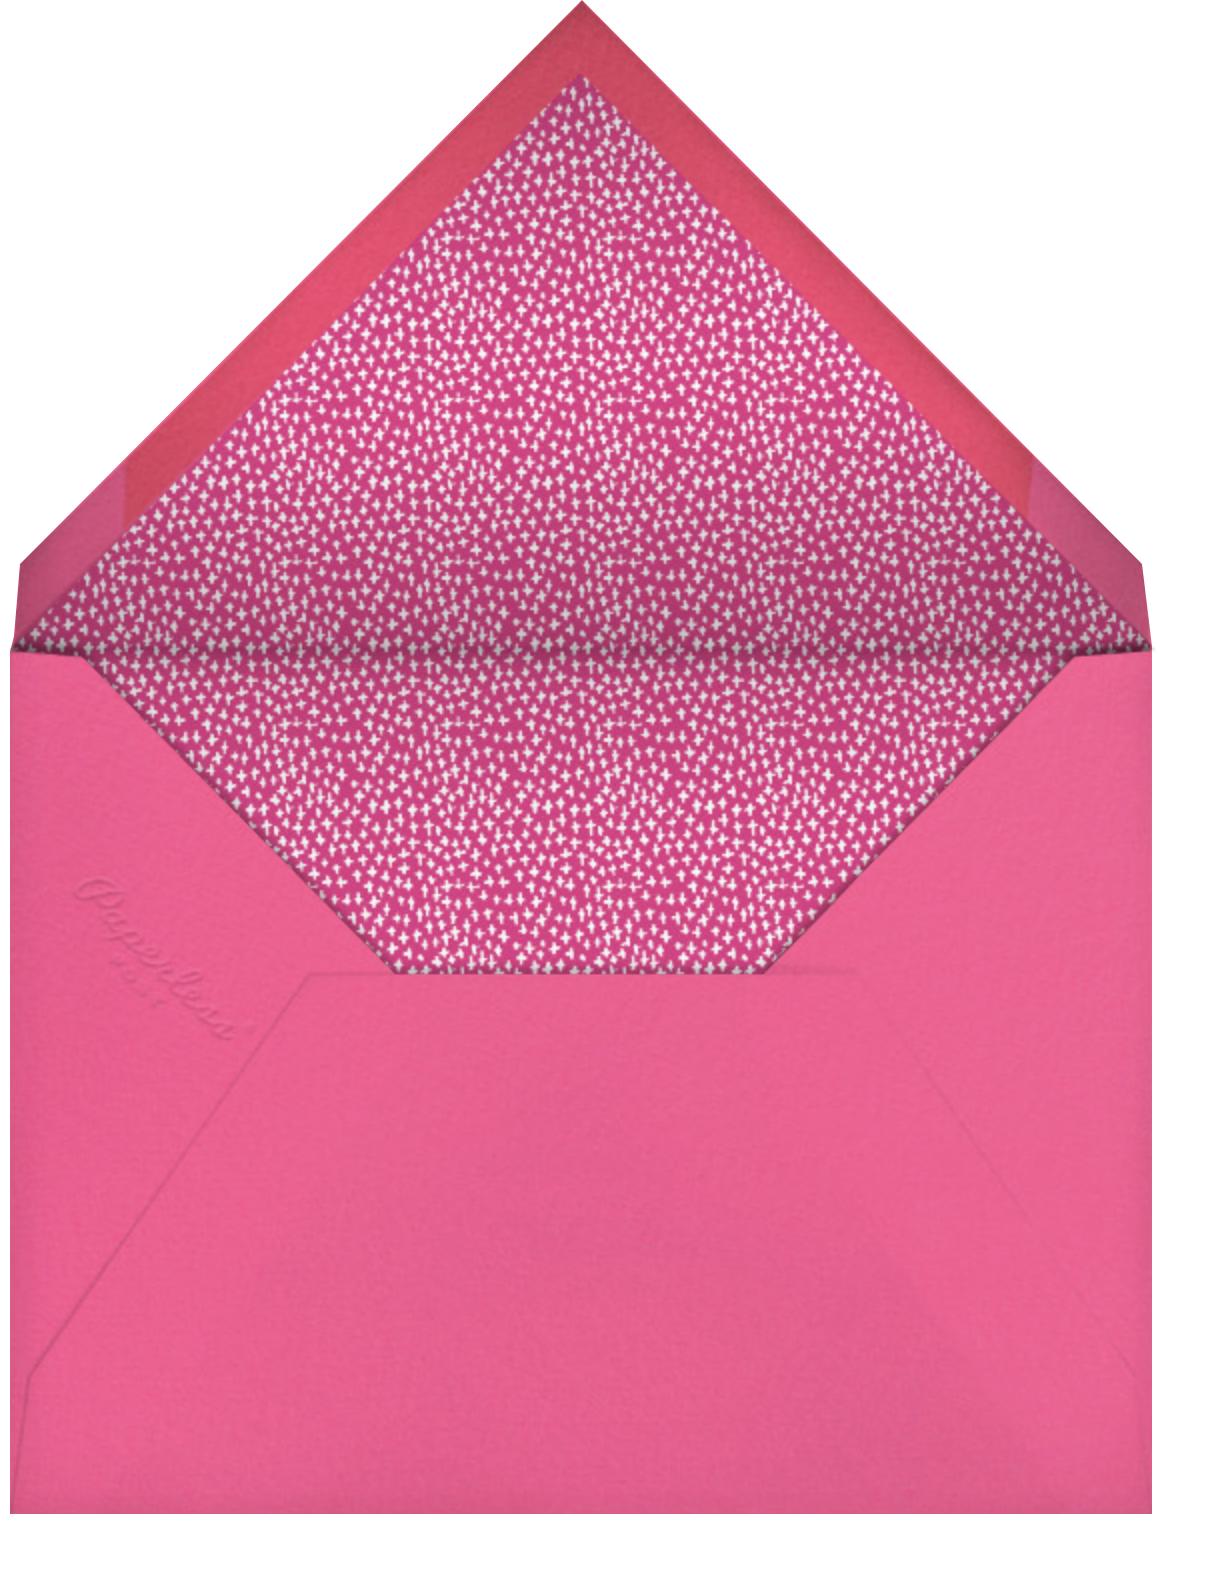 Party's Going Swimmingly - Fair - Mr. Boddington's Studio - Kids' birthday - envelope back